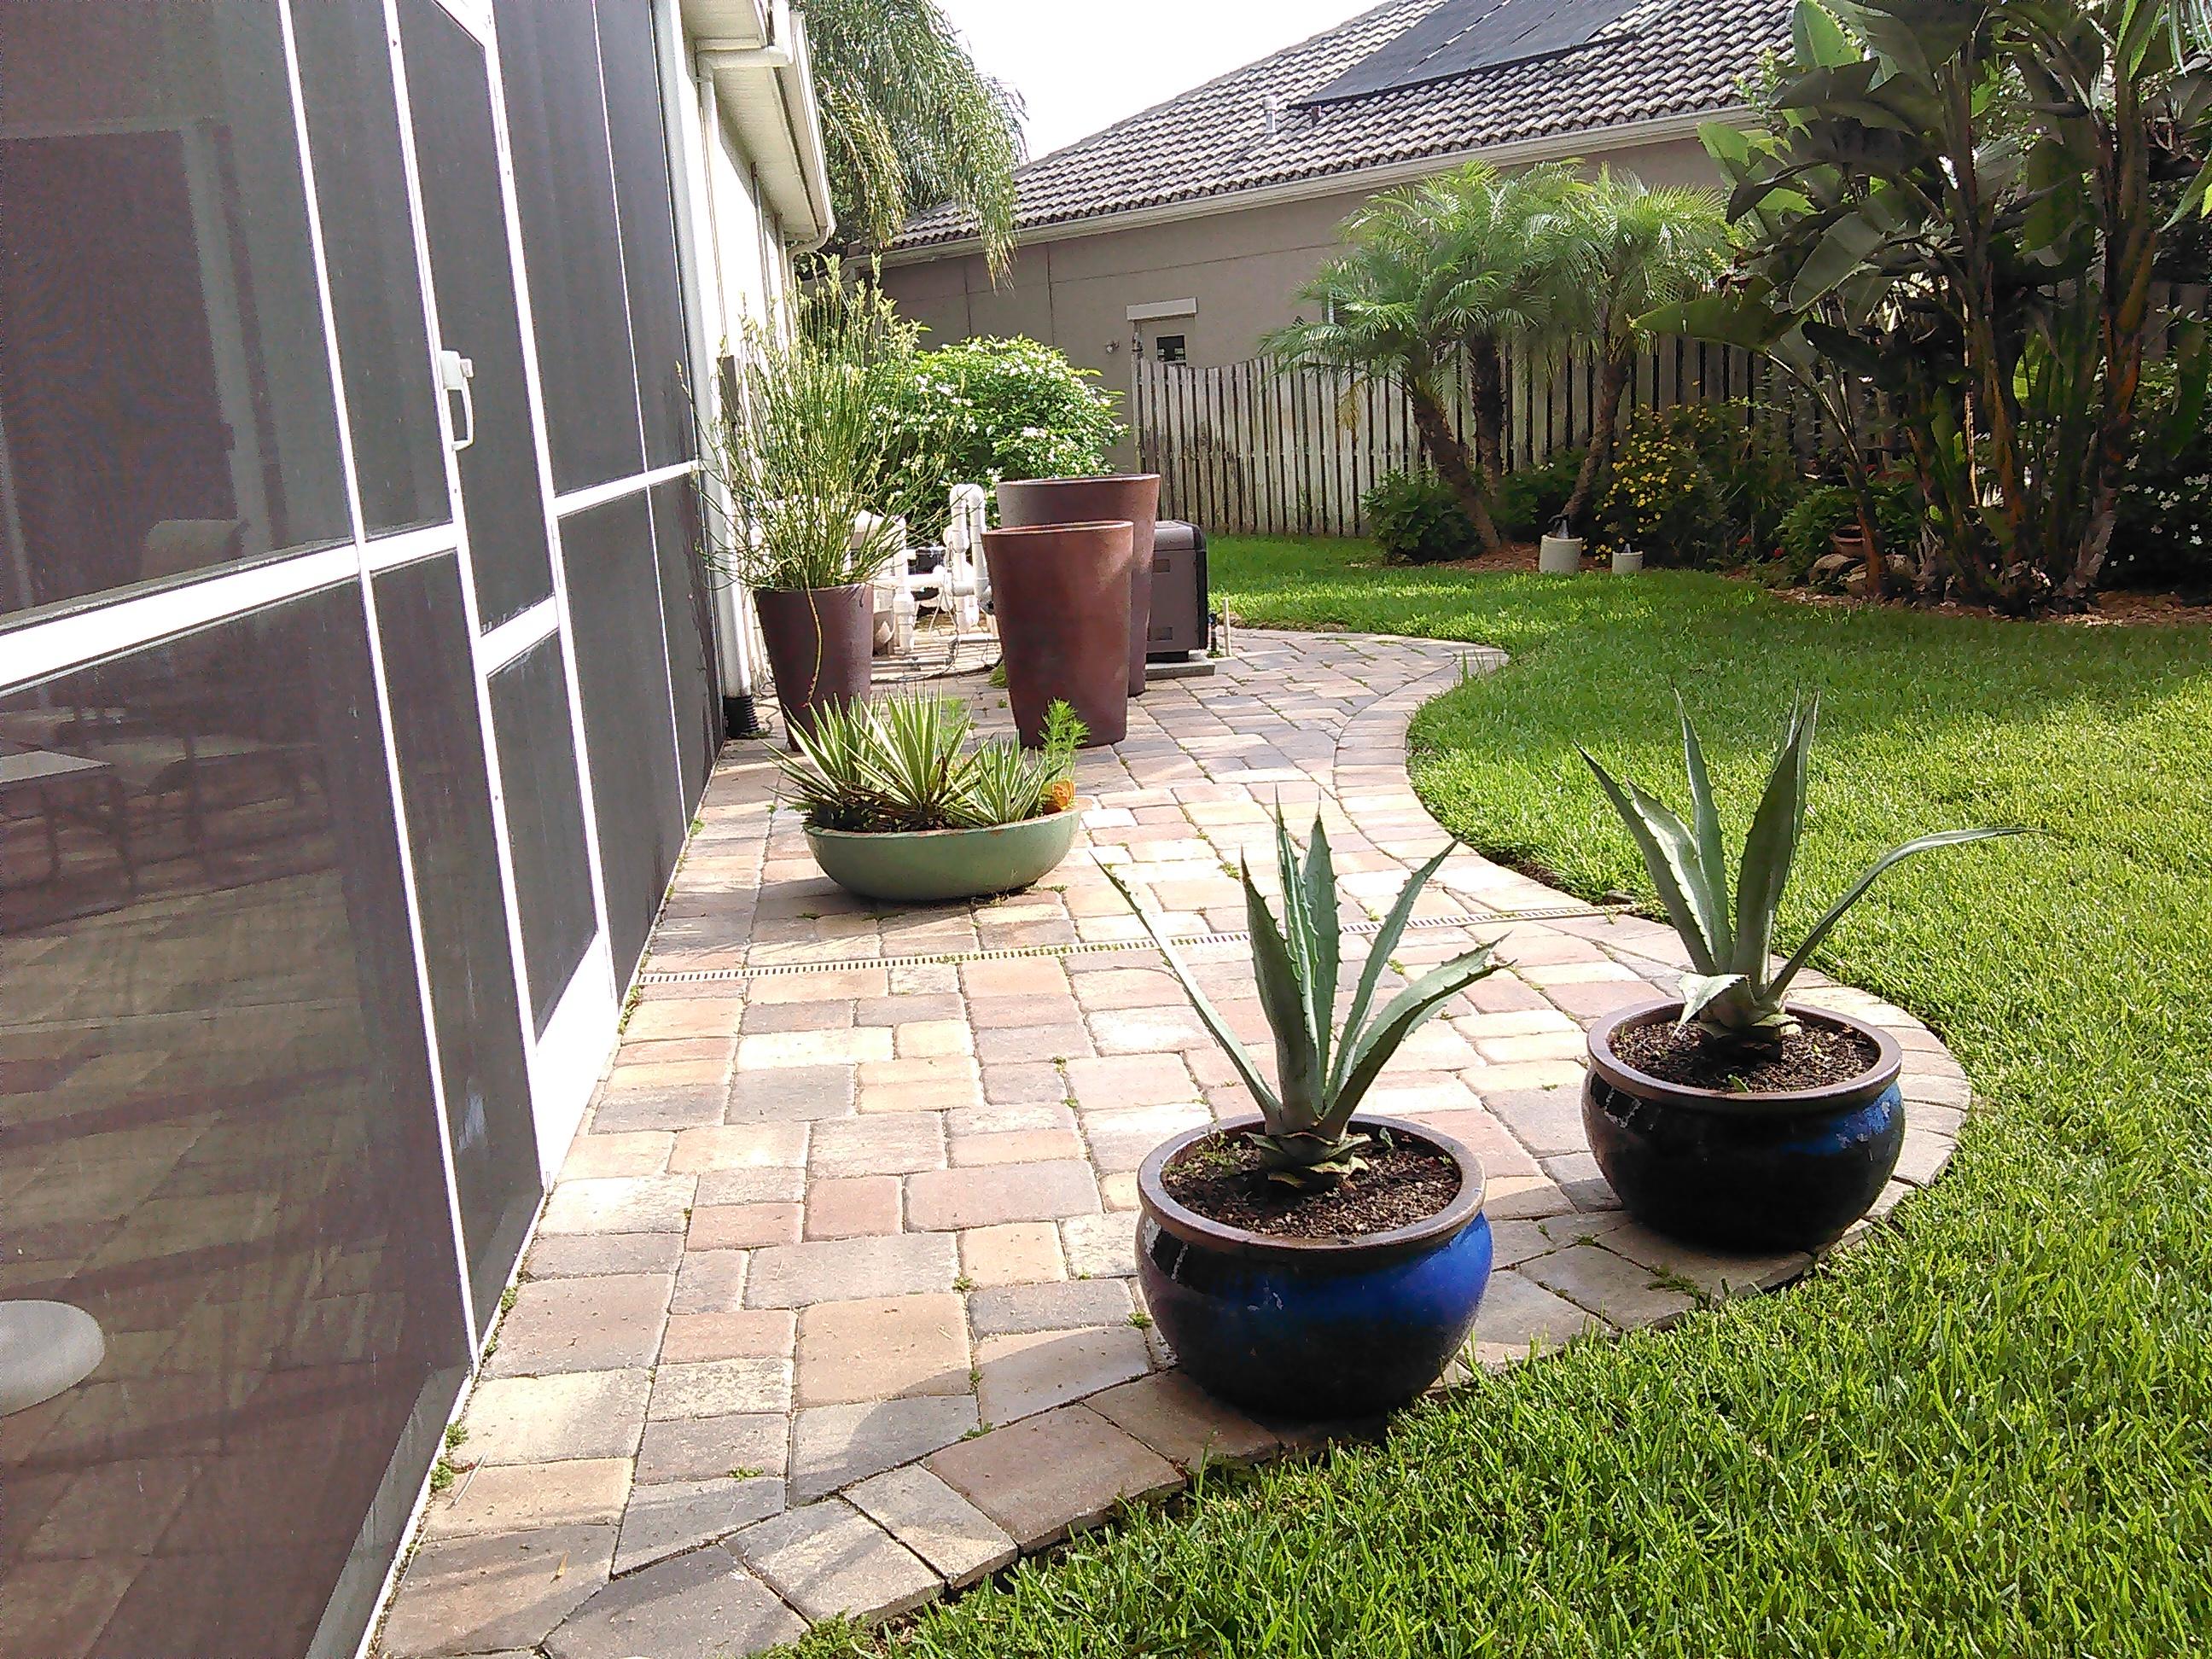 Johns Palms Landscaping image 11